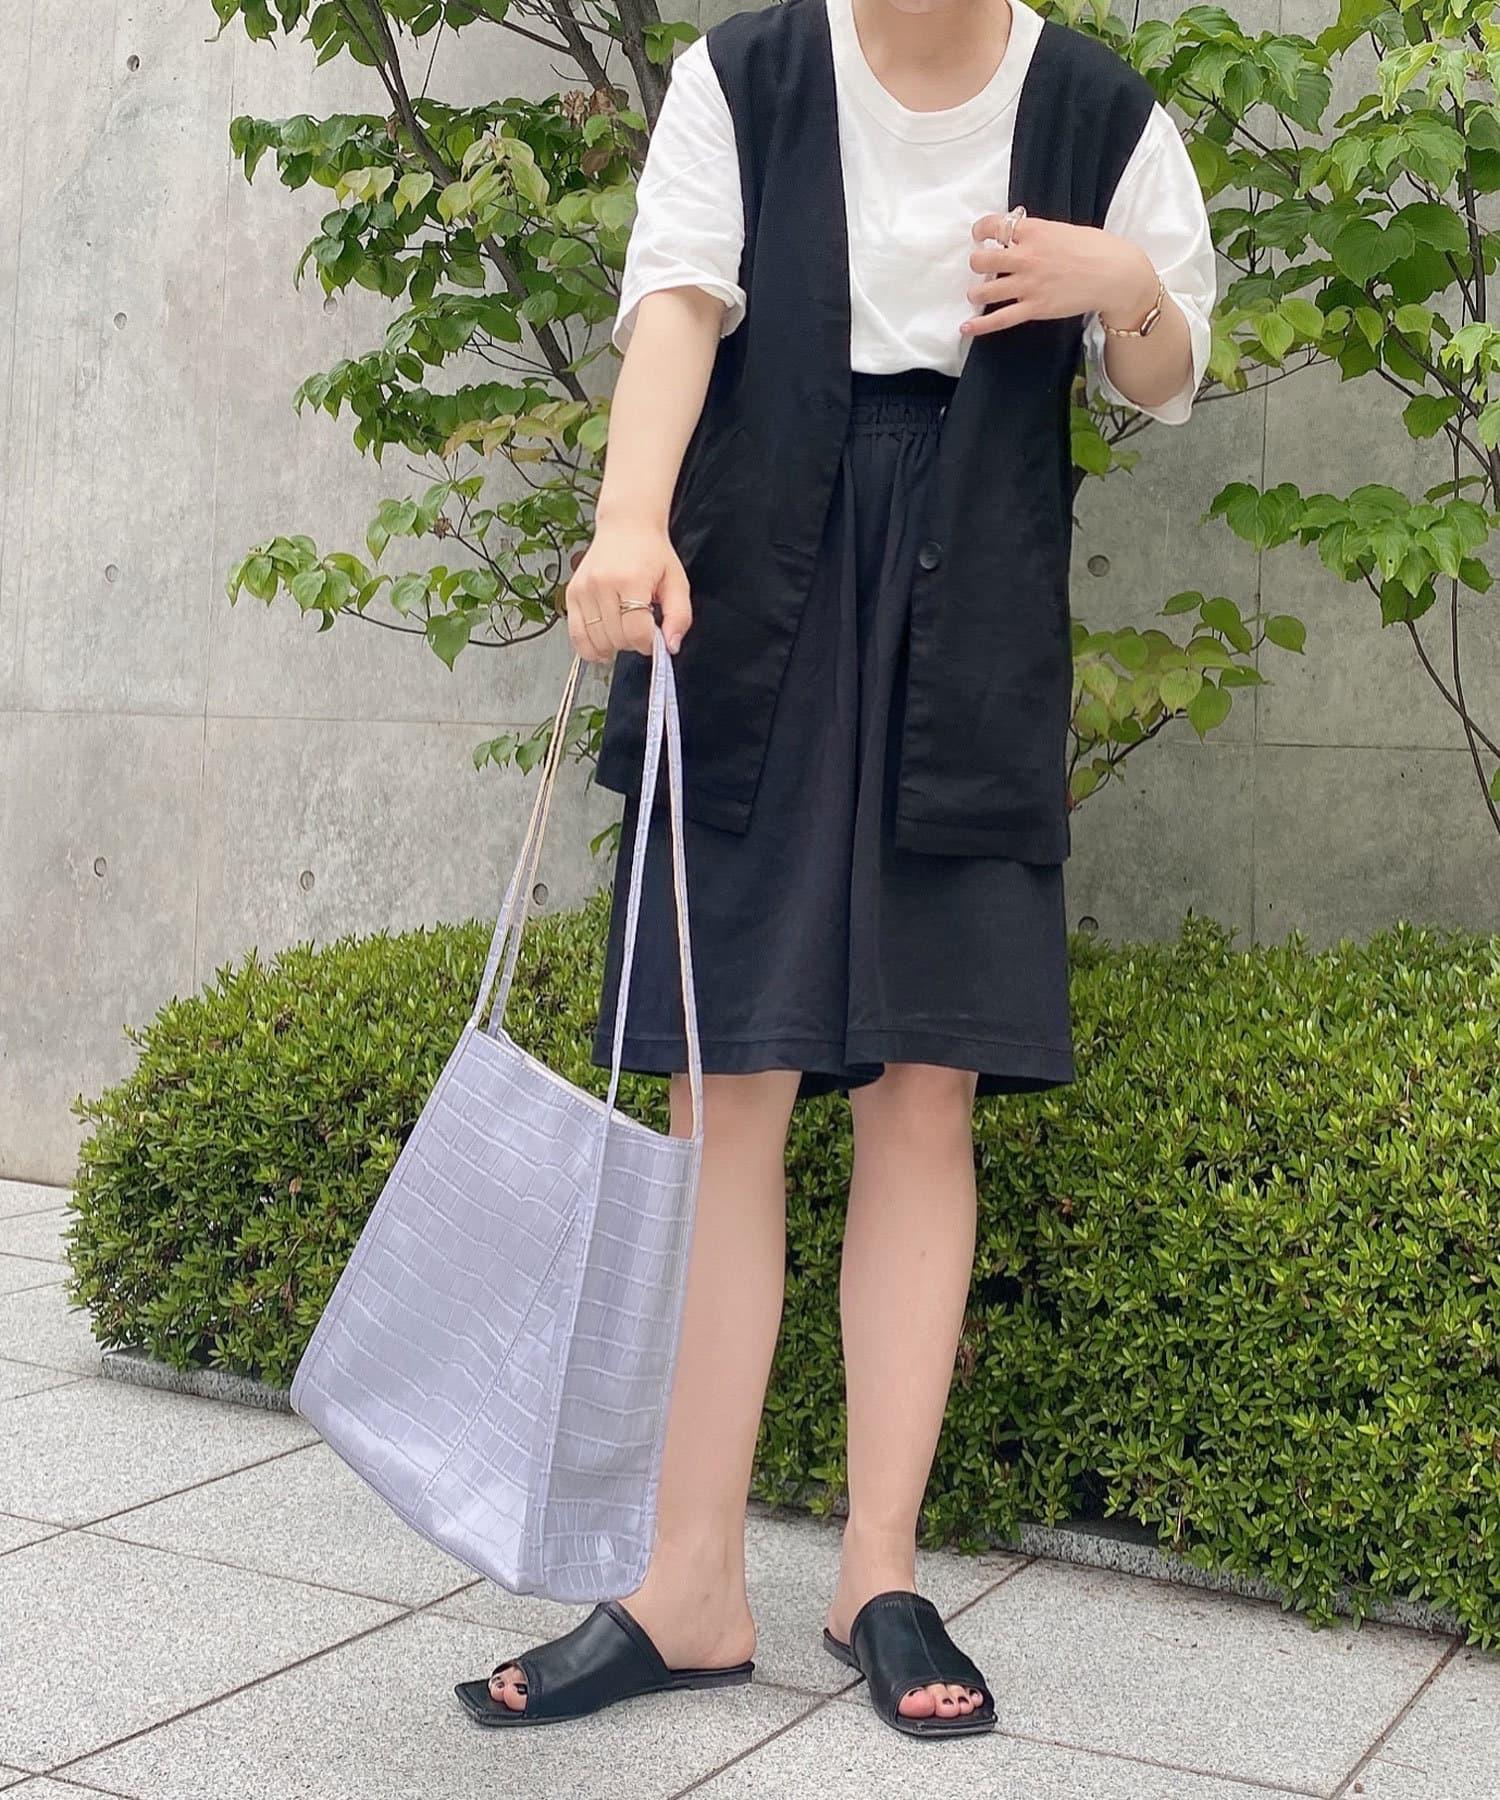 Lattice(ラティス) トートBAG【着用動画有り】